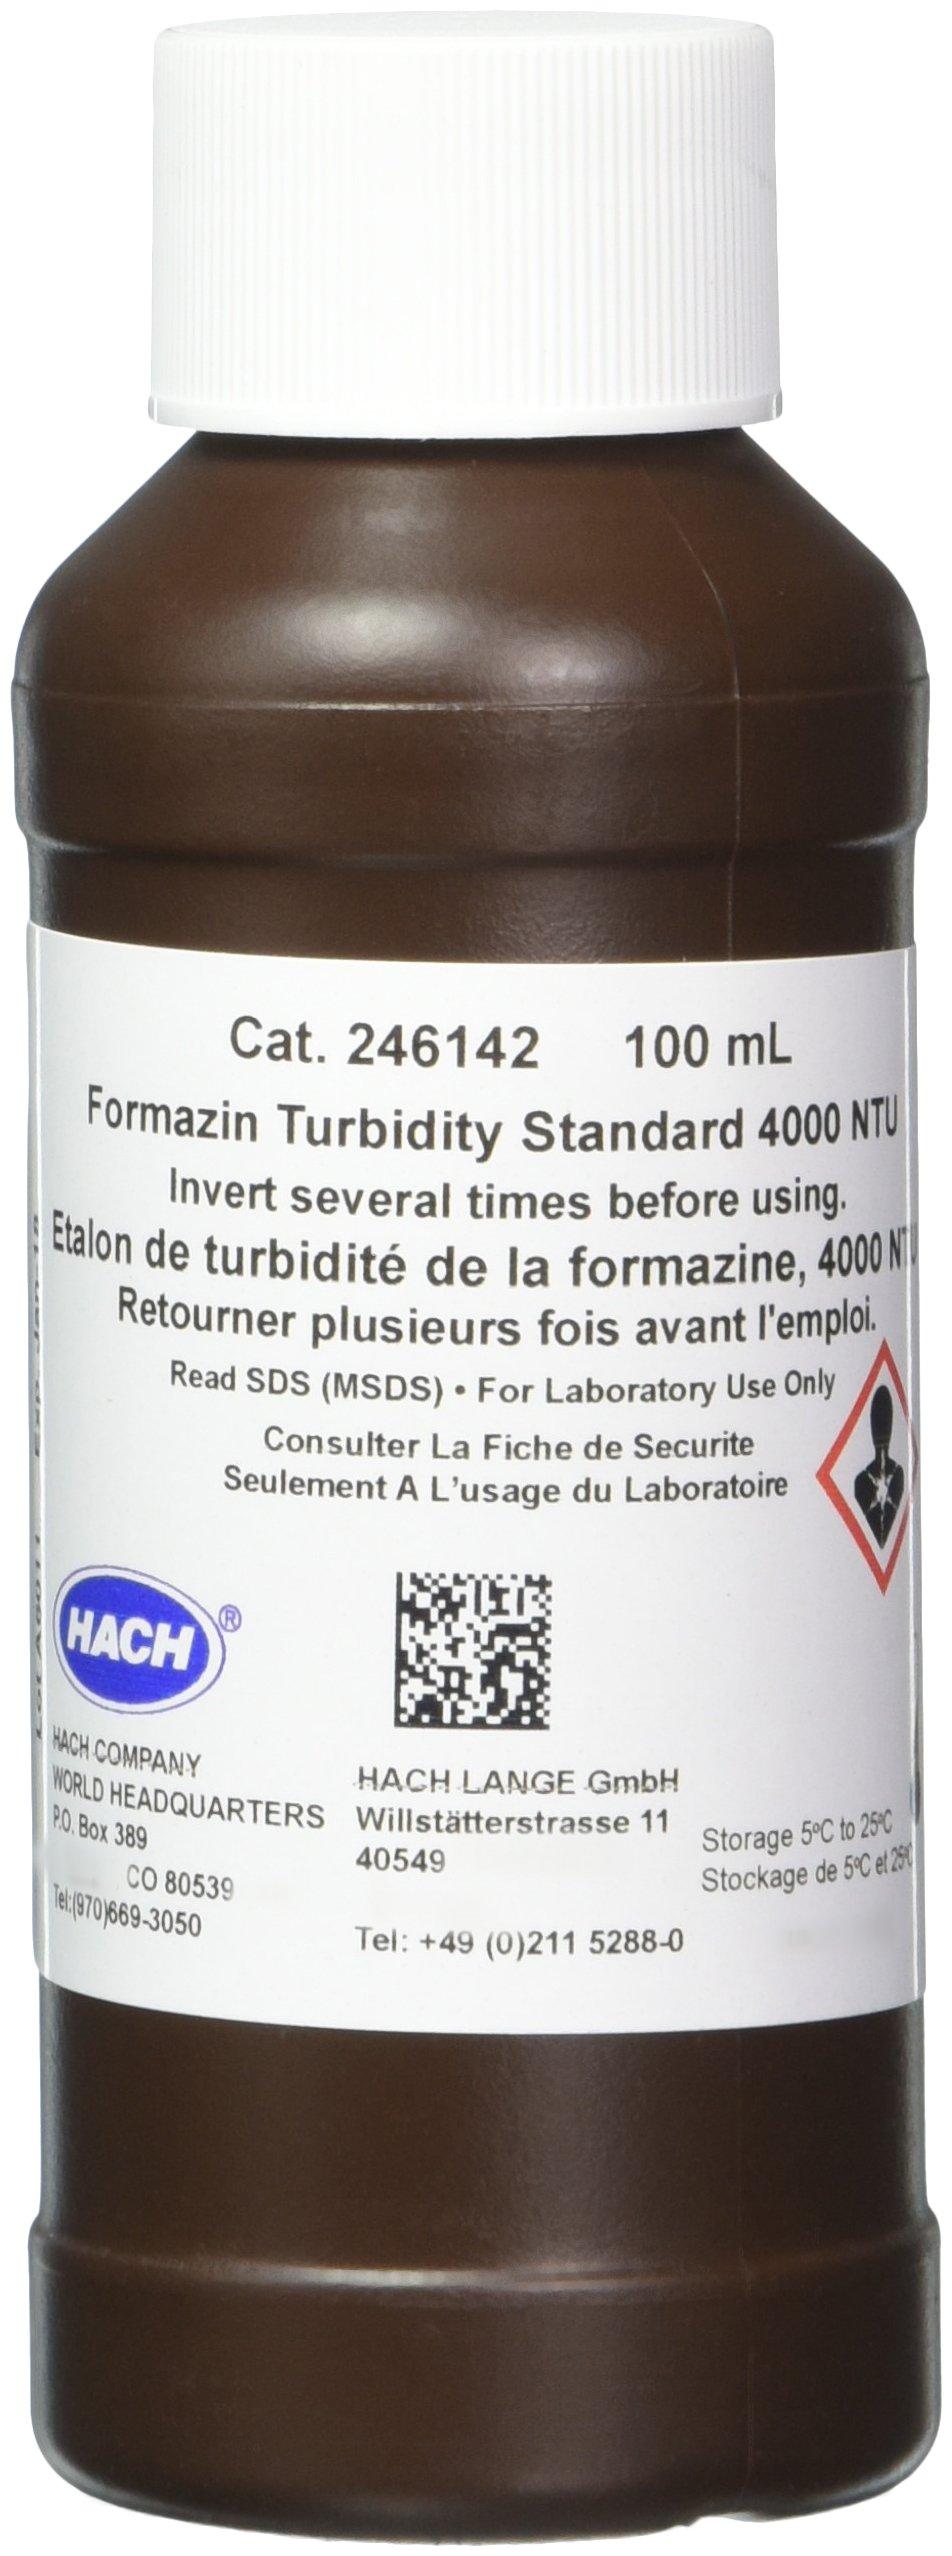 Hach 246142 Formazin Turbidity Standard, 4000 NTU, 100 mL